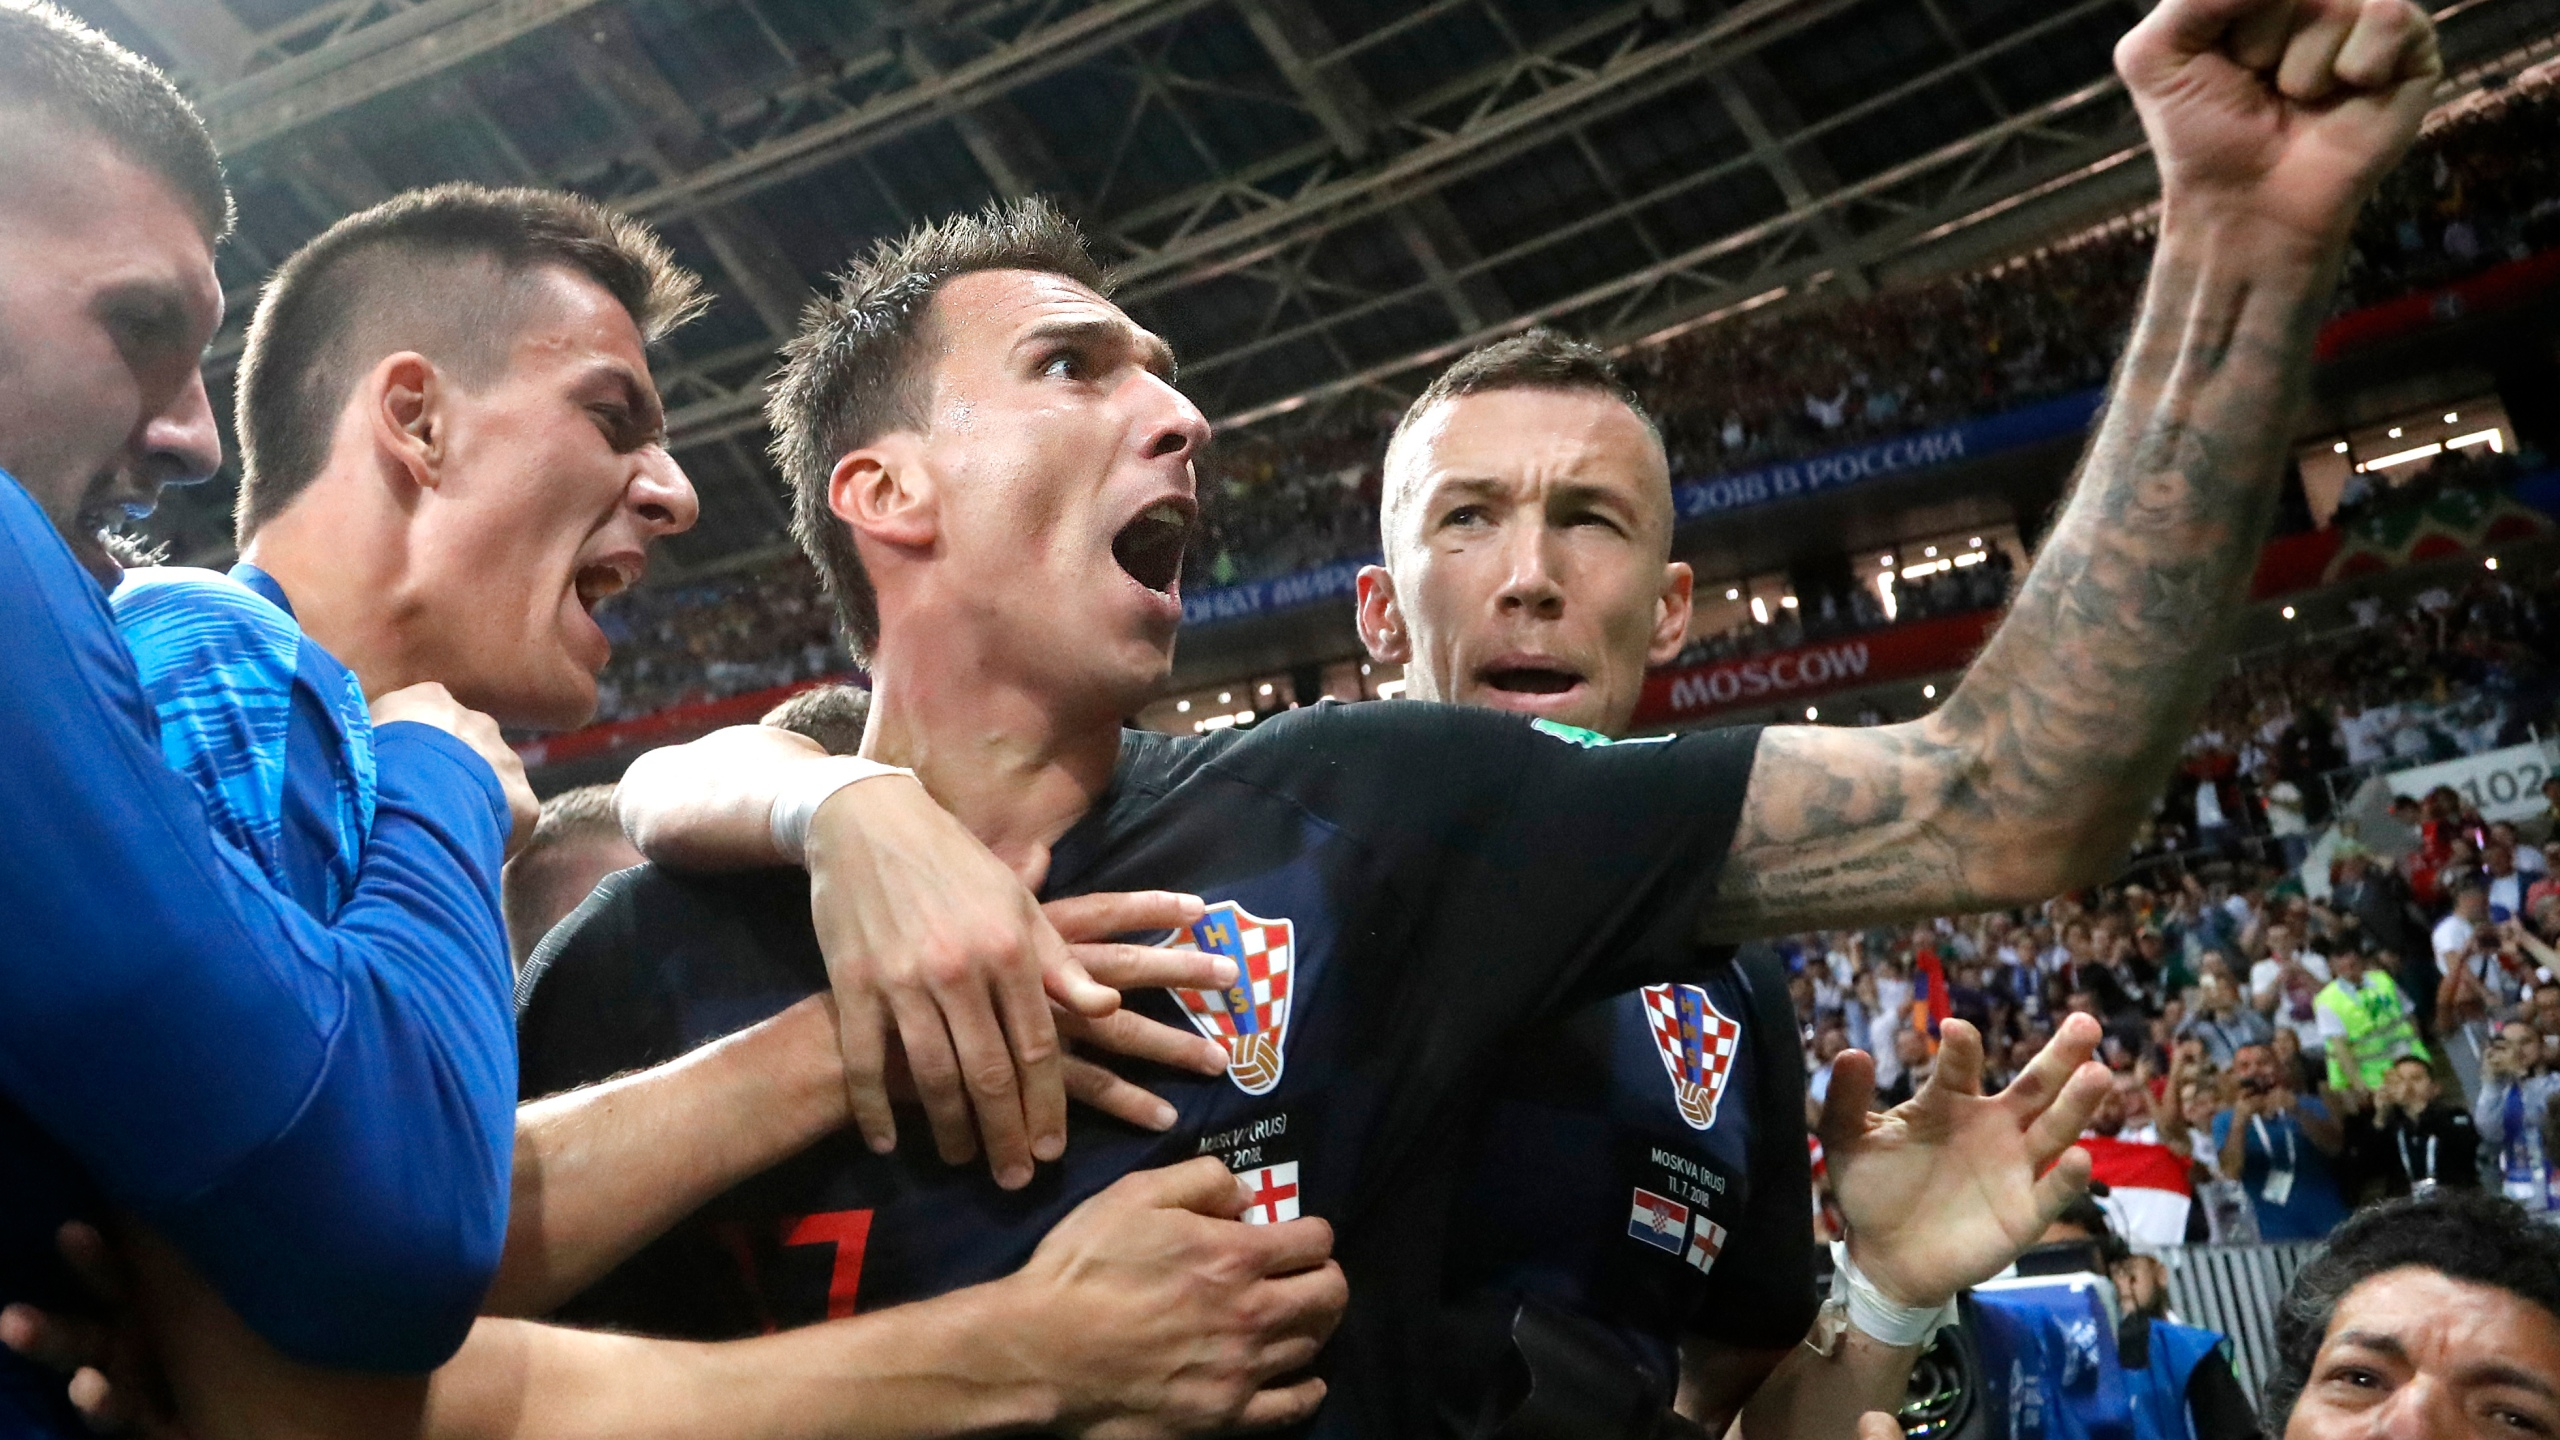 APTOPIX Russia Soccer WCup Croatia England_1531342310940